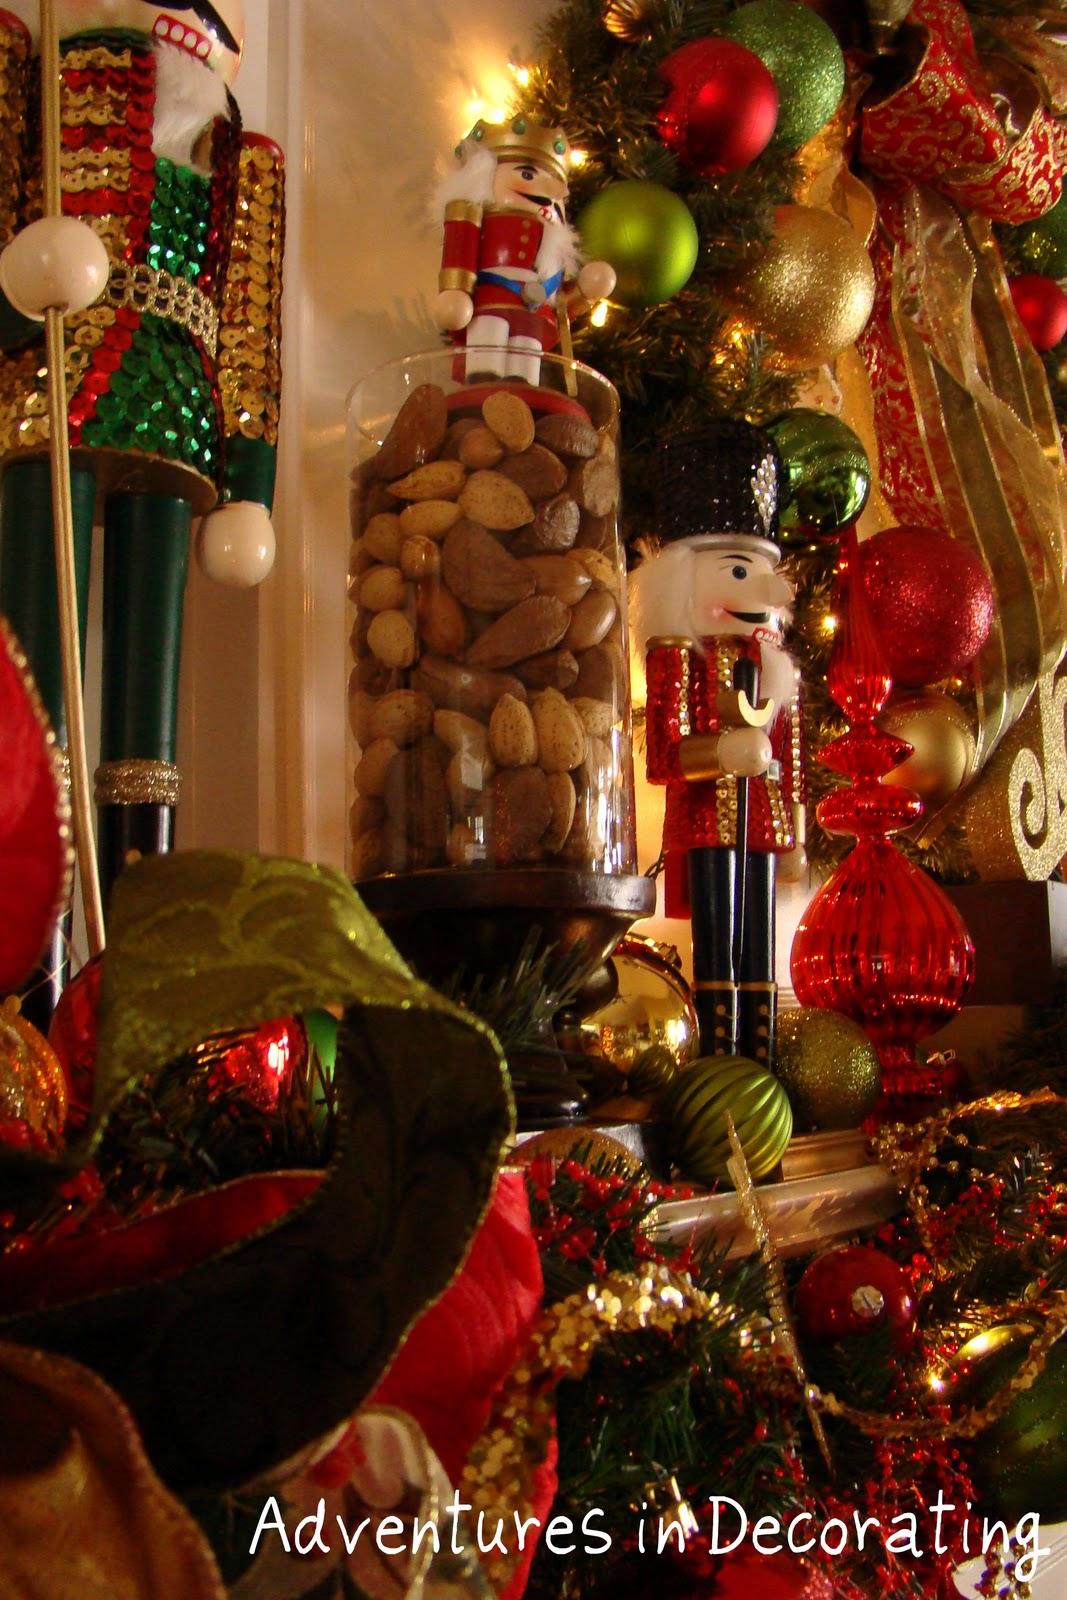 Adventures in Decorating: Nutcracker Mantel